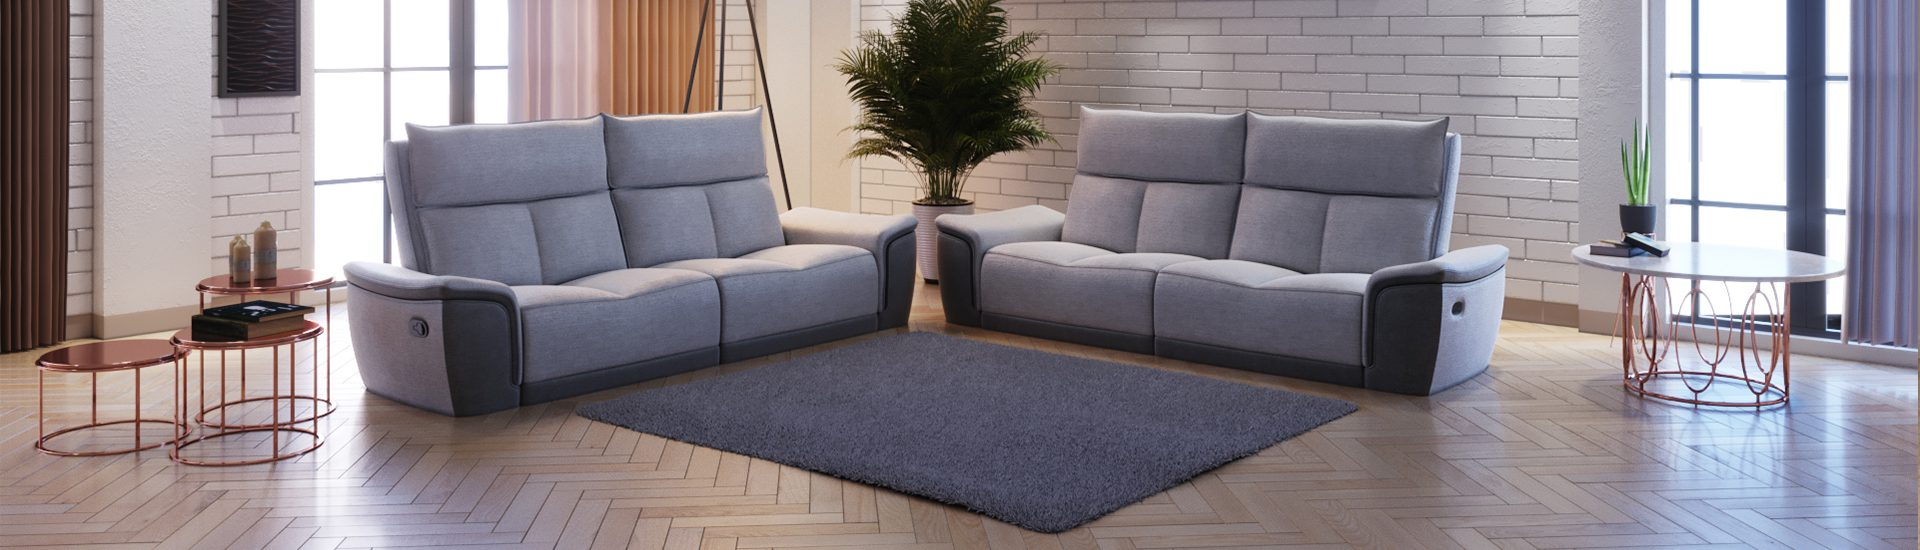 Мягкая мебель вариант 2+3